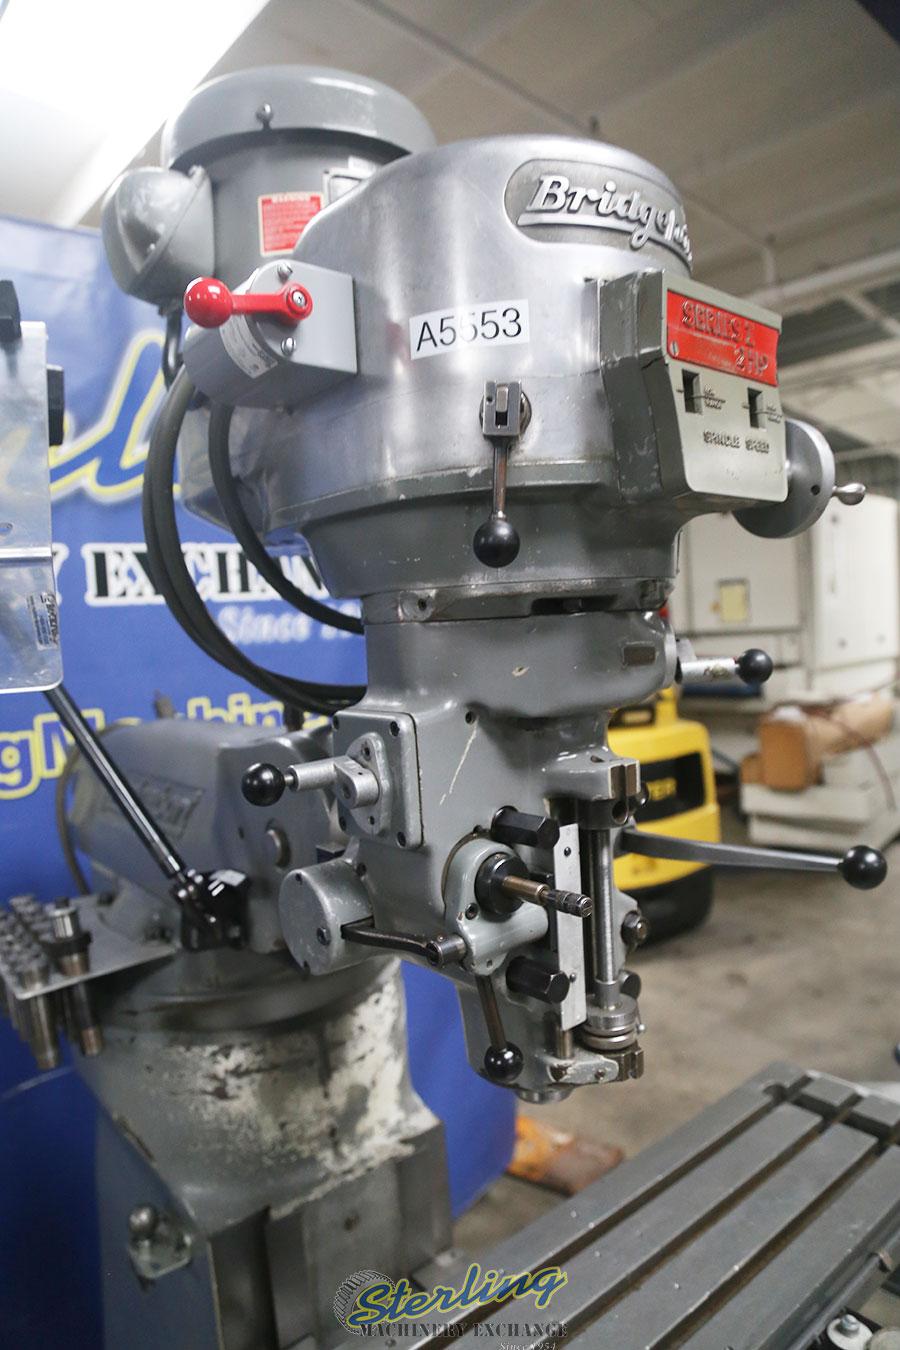 Used Bridgeport Vertical Milling Machine Sterling Machinery